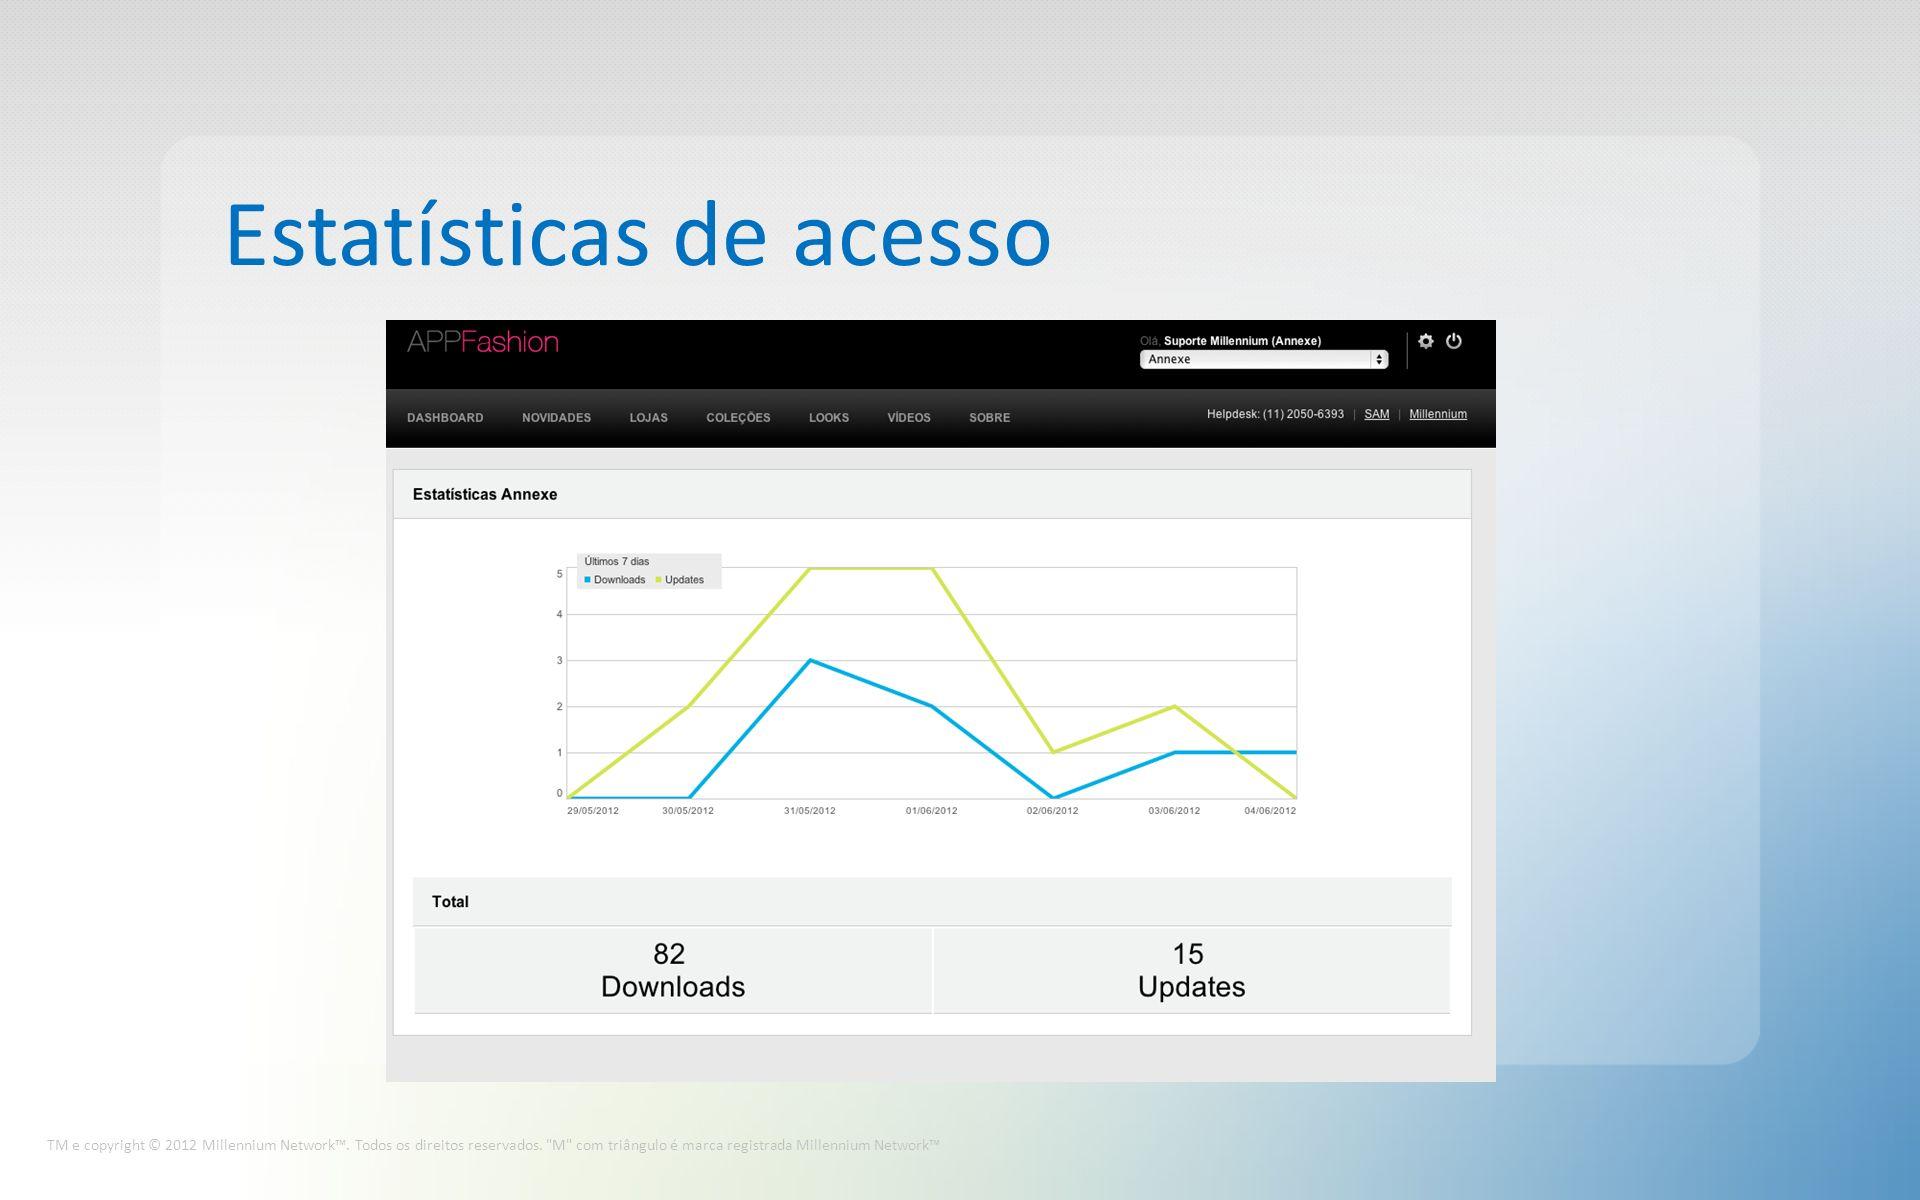 Estatísticas de acesso TM e copyright © 2012 Millennium Network.